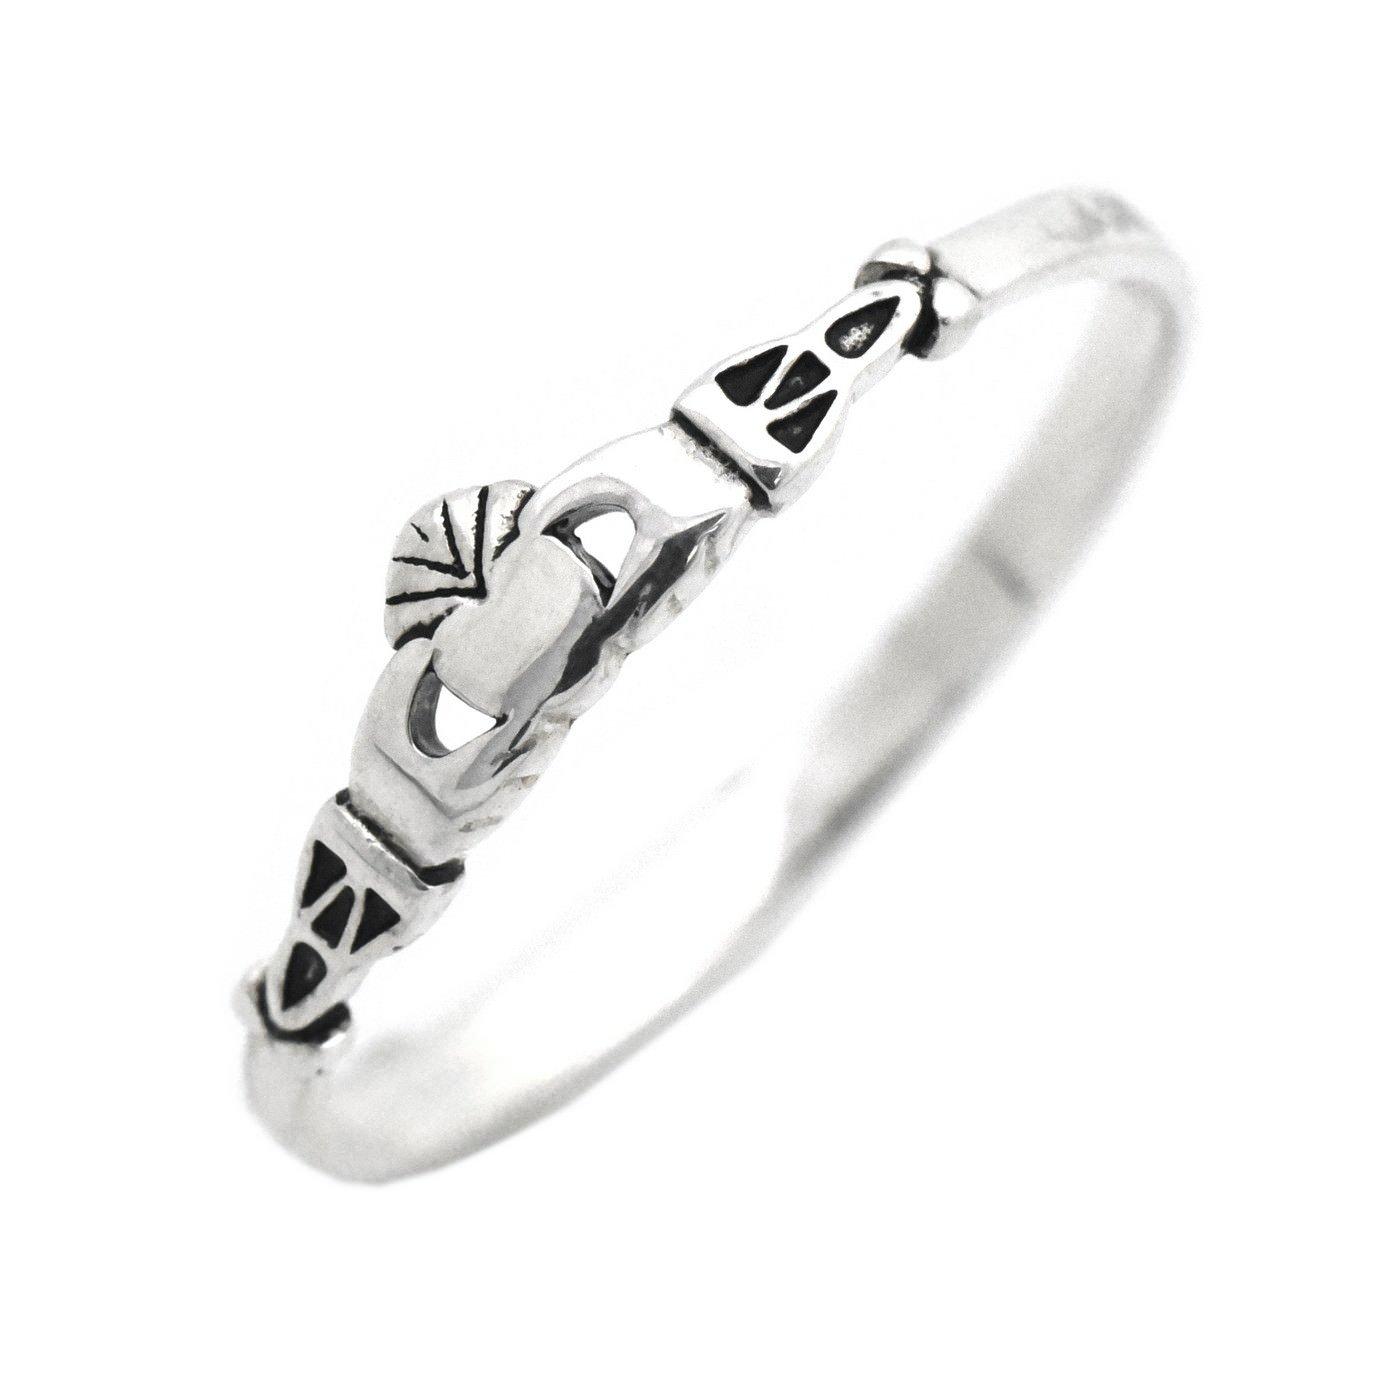 Irish Claddagh Ring 925 Sterling Silver Celtic Dainty Childrens Girls Womens Size 5